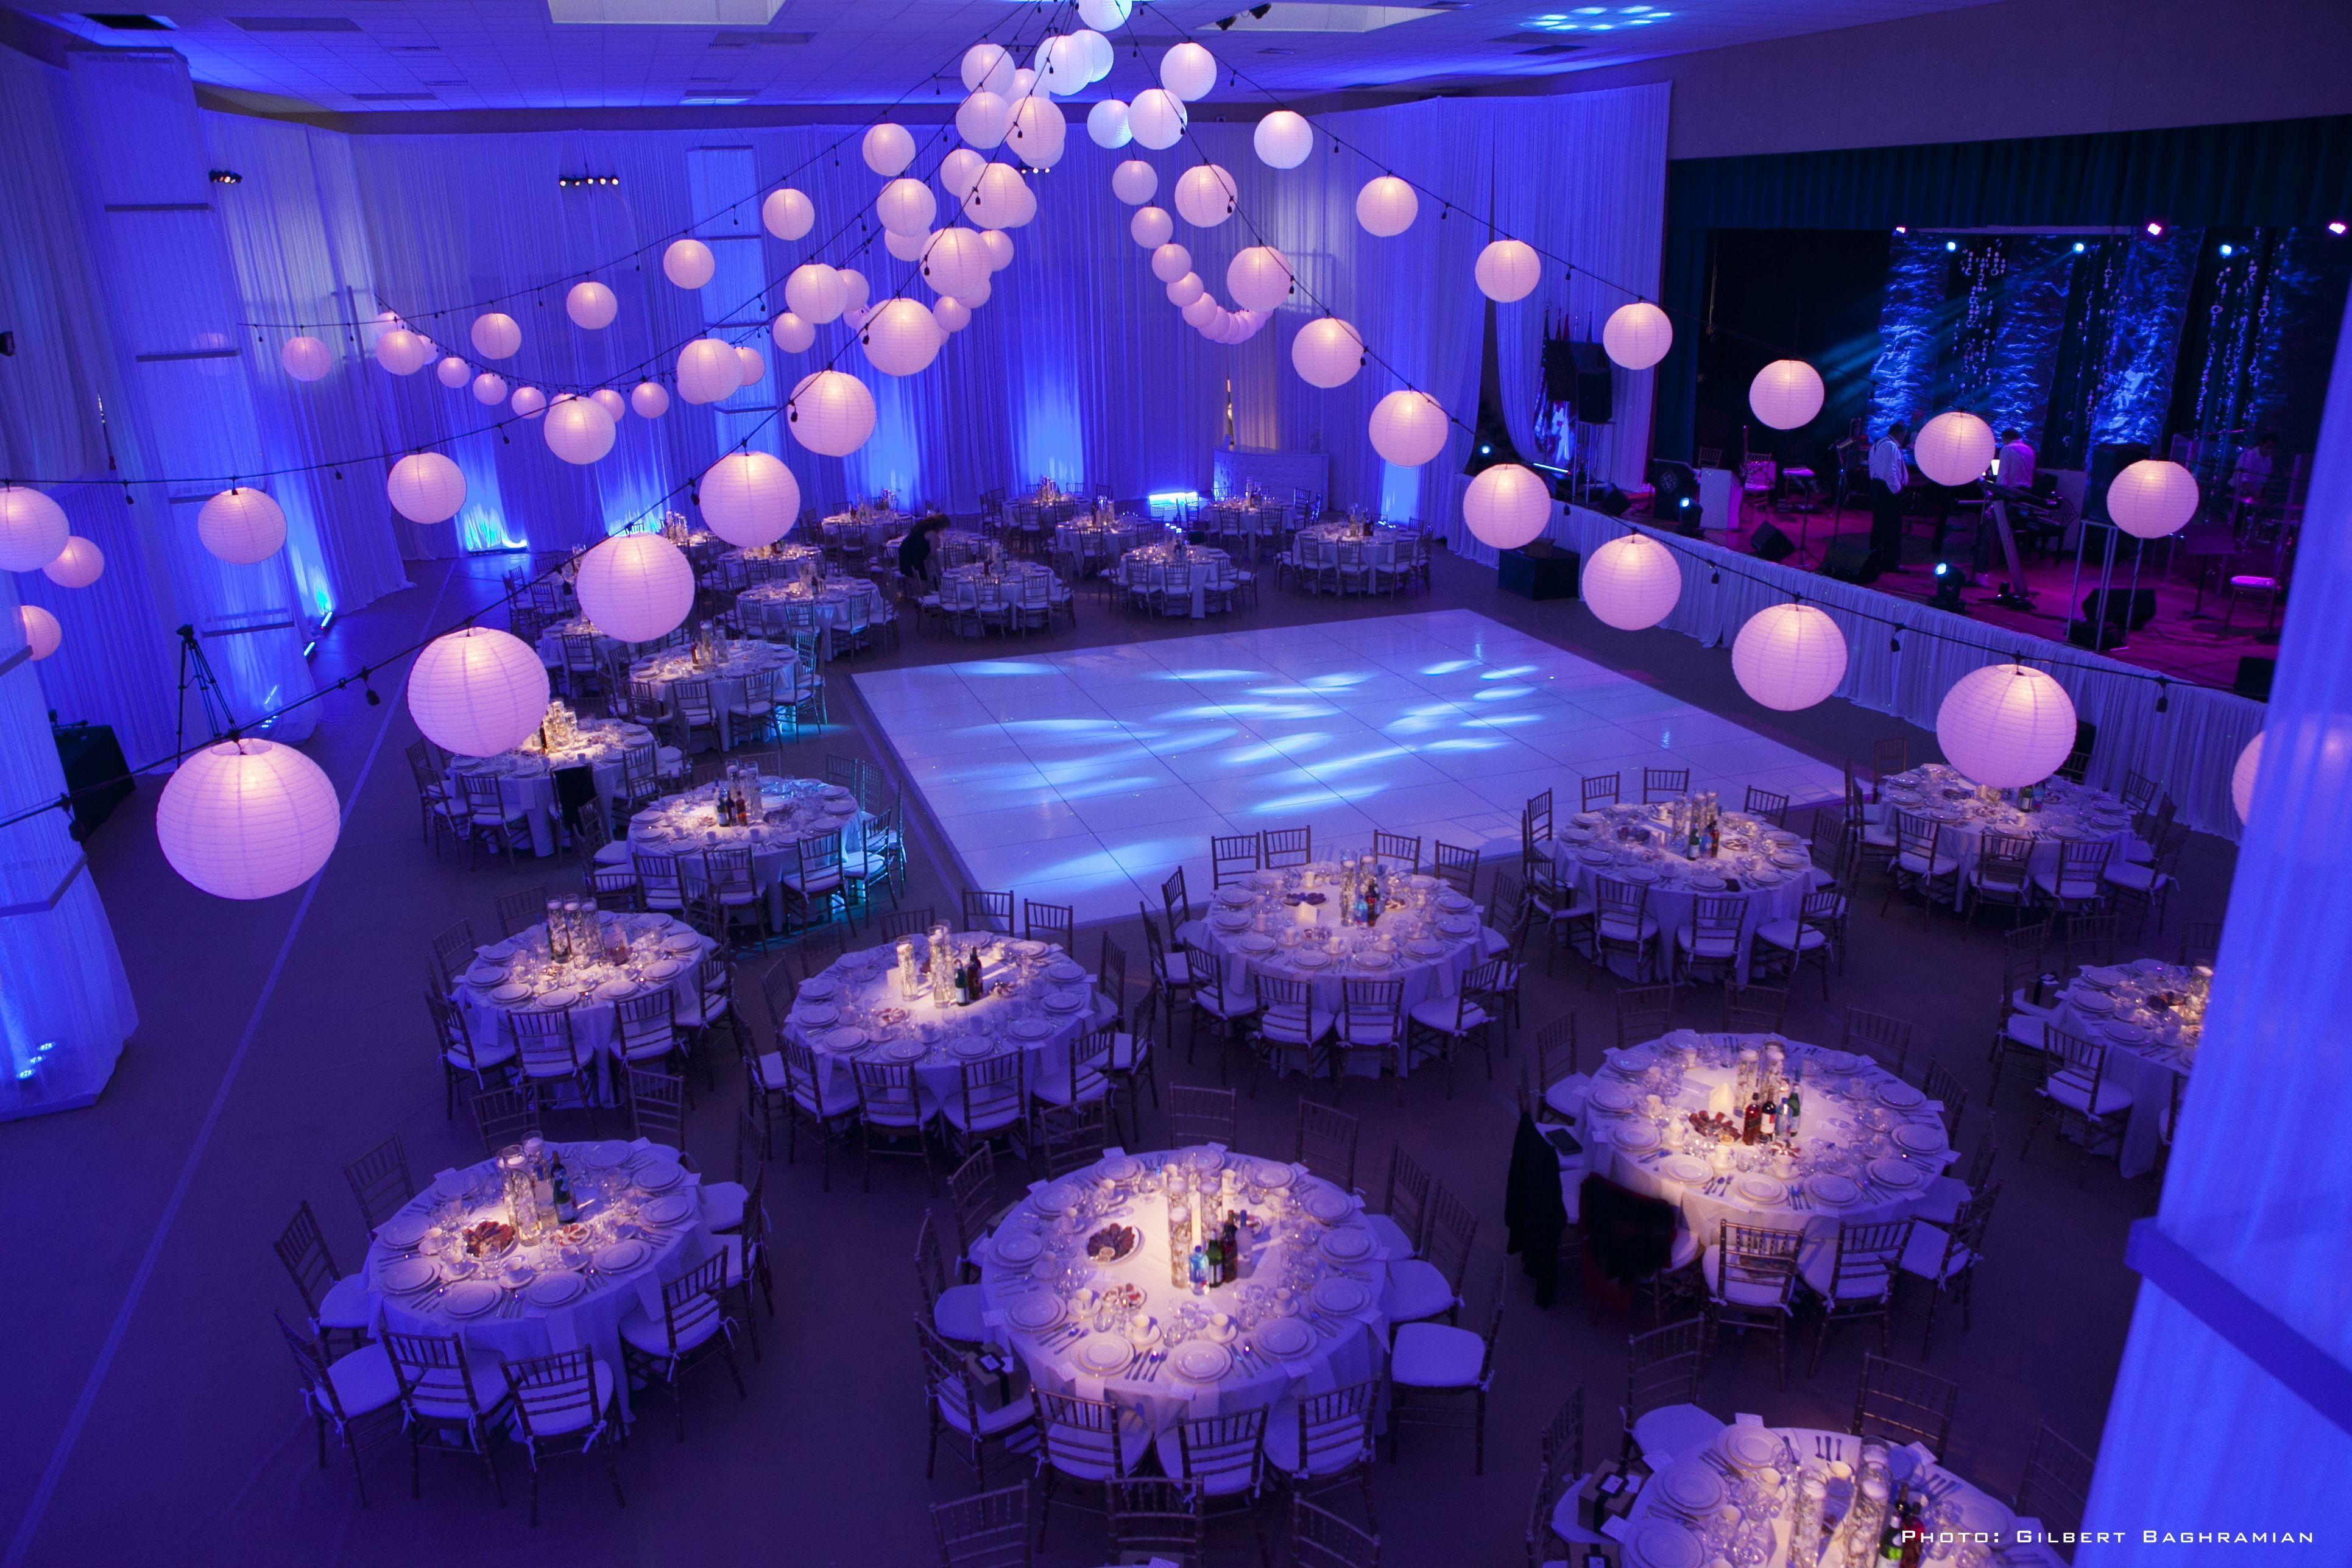 Fancy indoor wedding reception decoration idea using paper lanterns